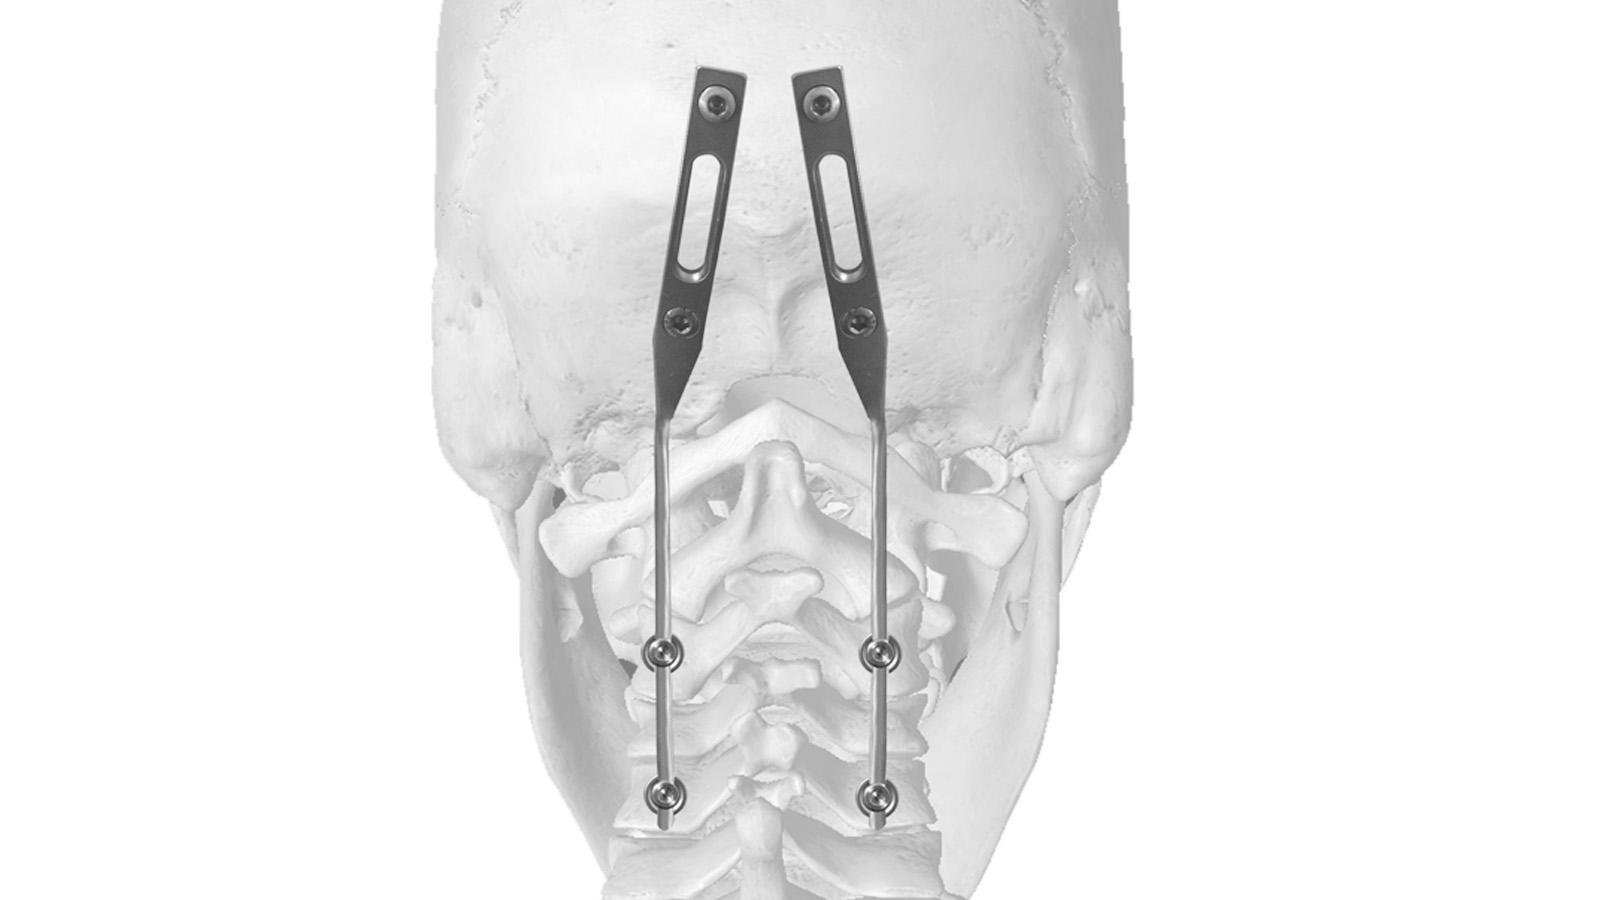 neuro-france-implants-joc-3